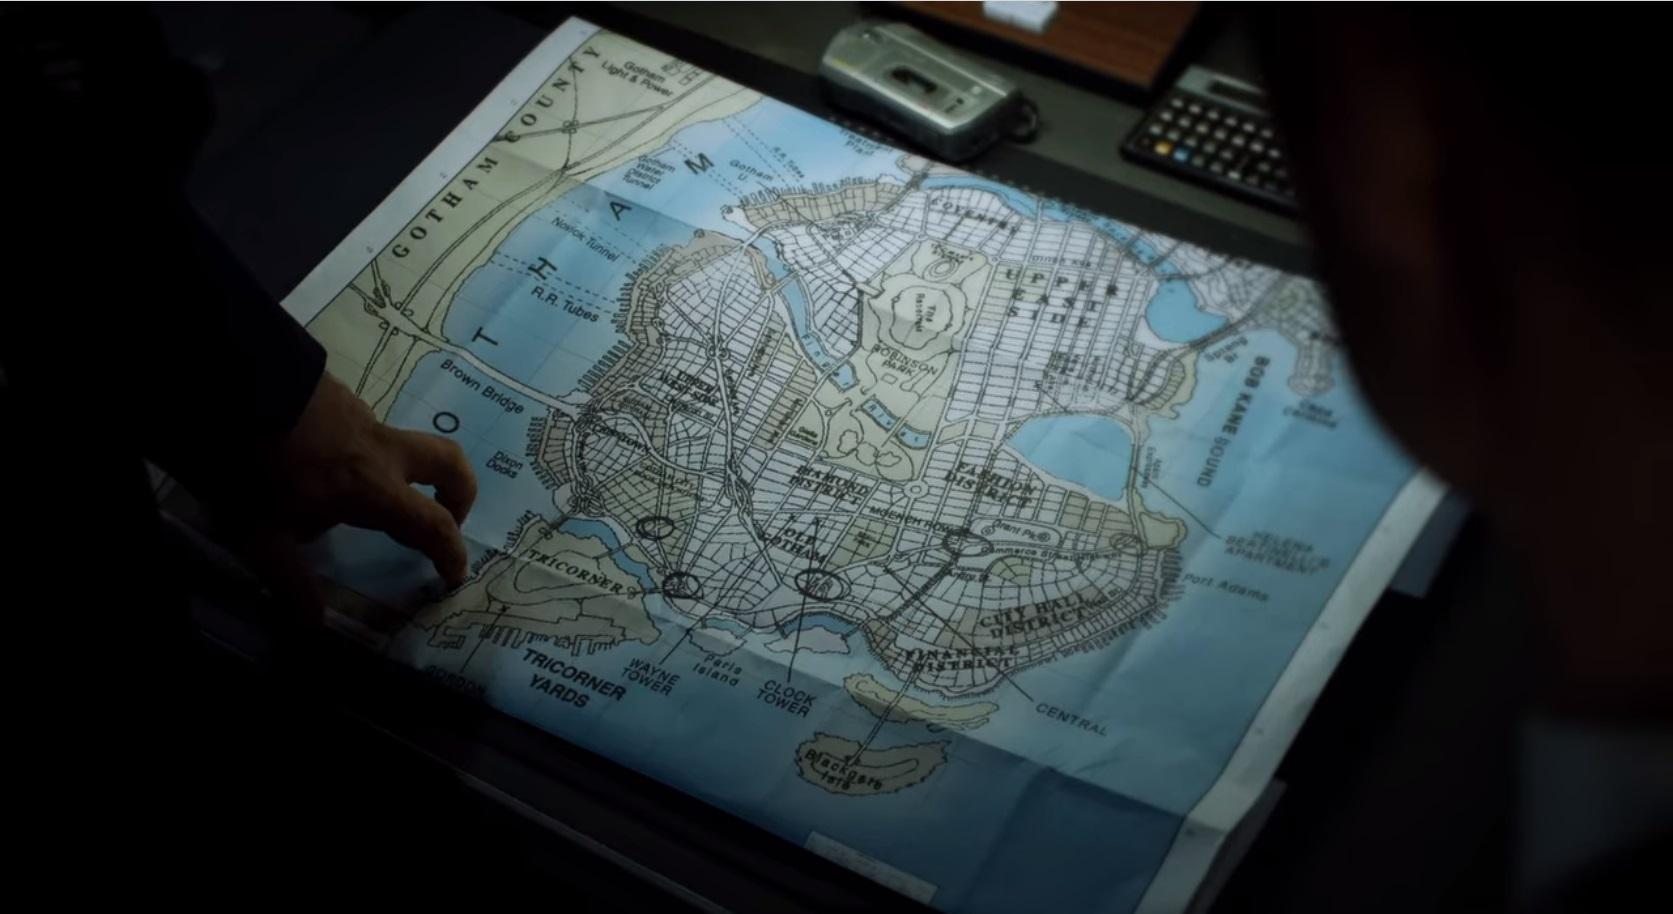 Helena Bertinelli (Gotham)